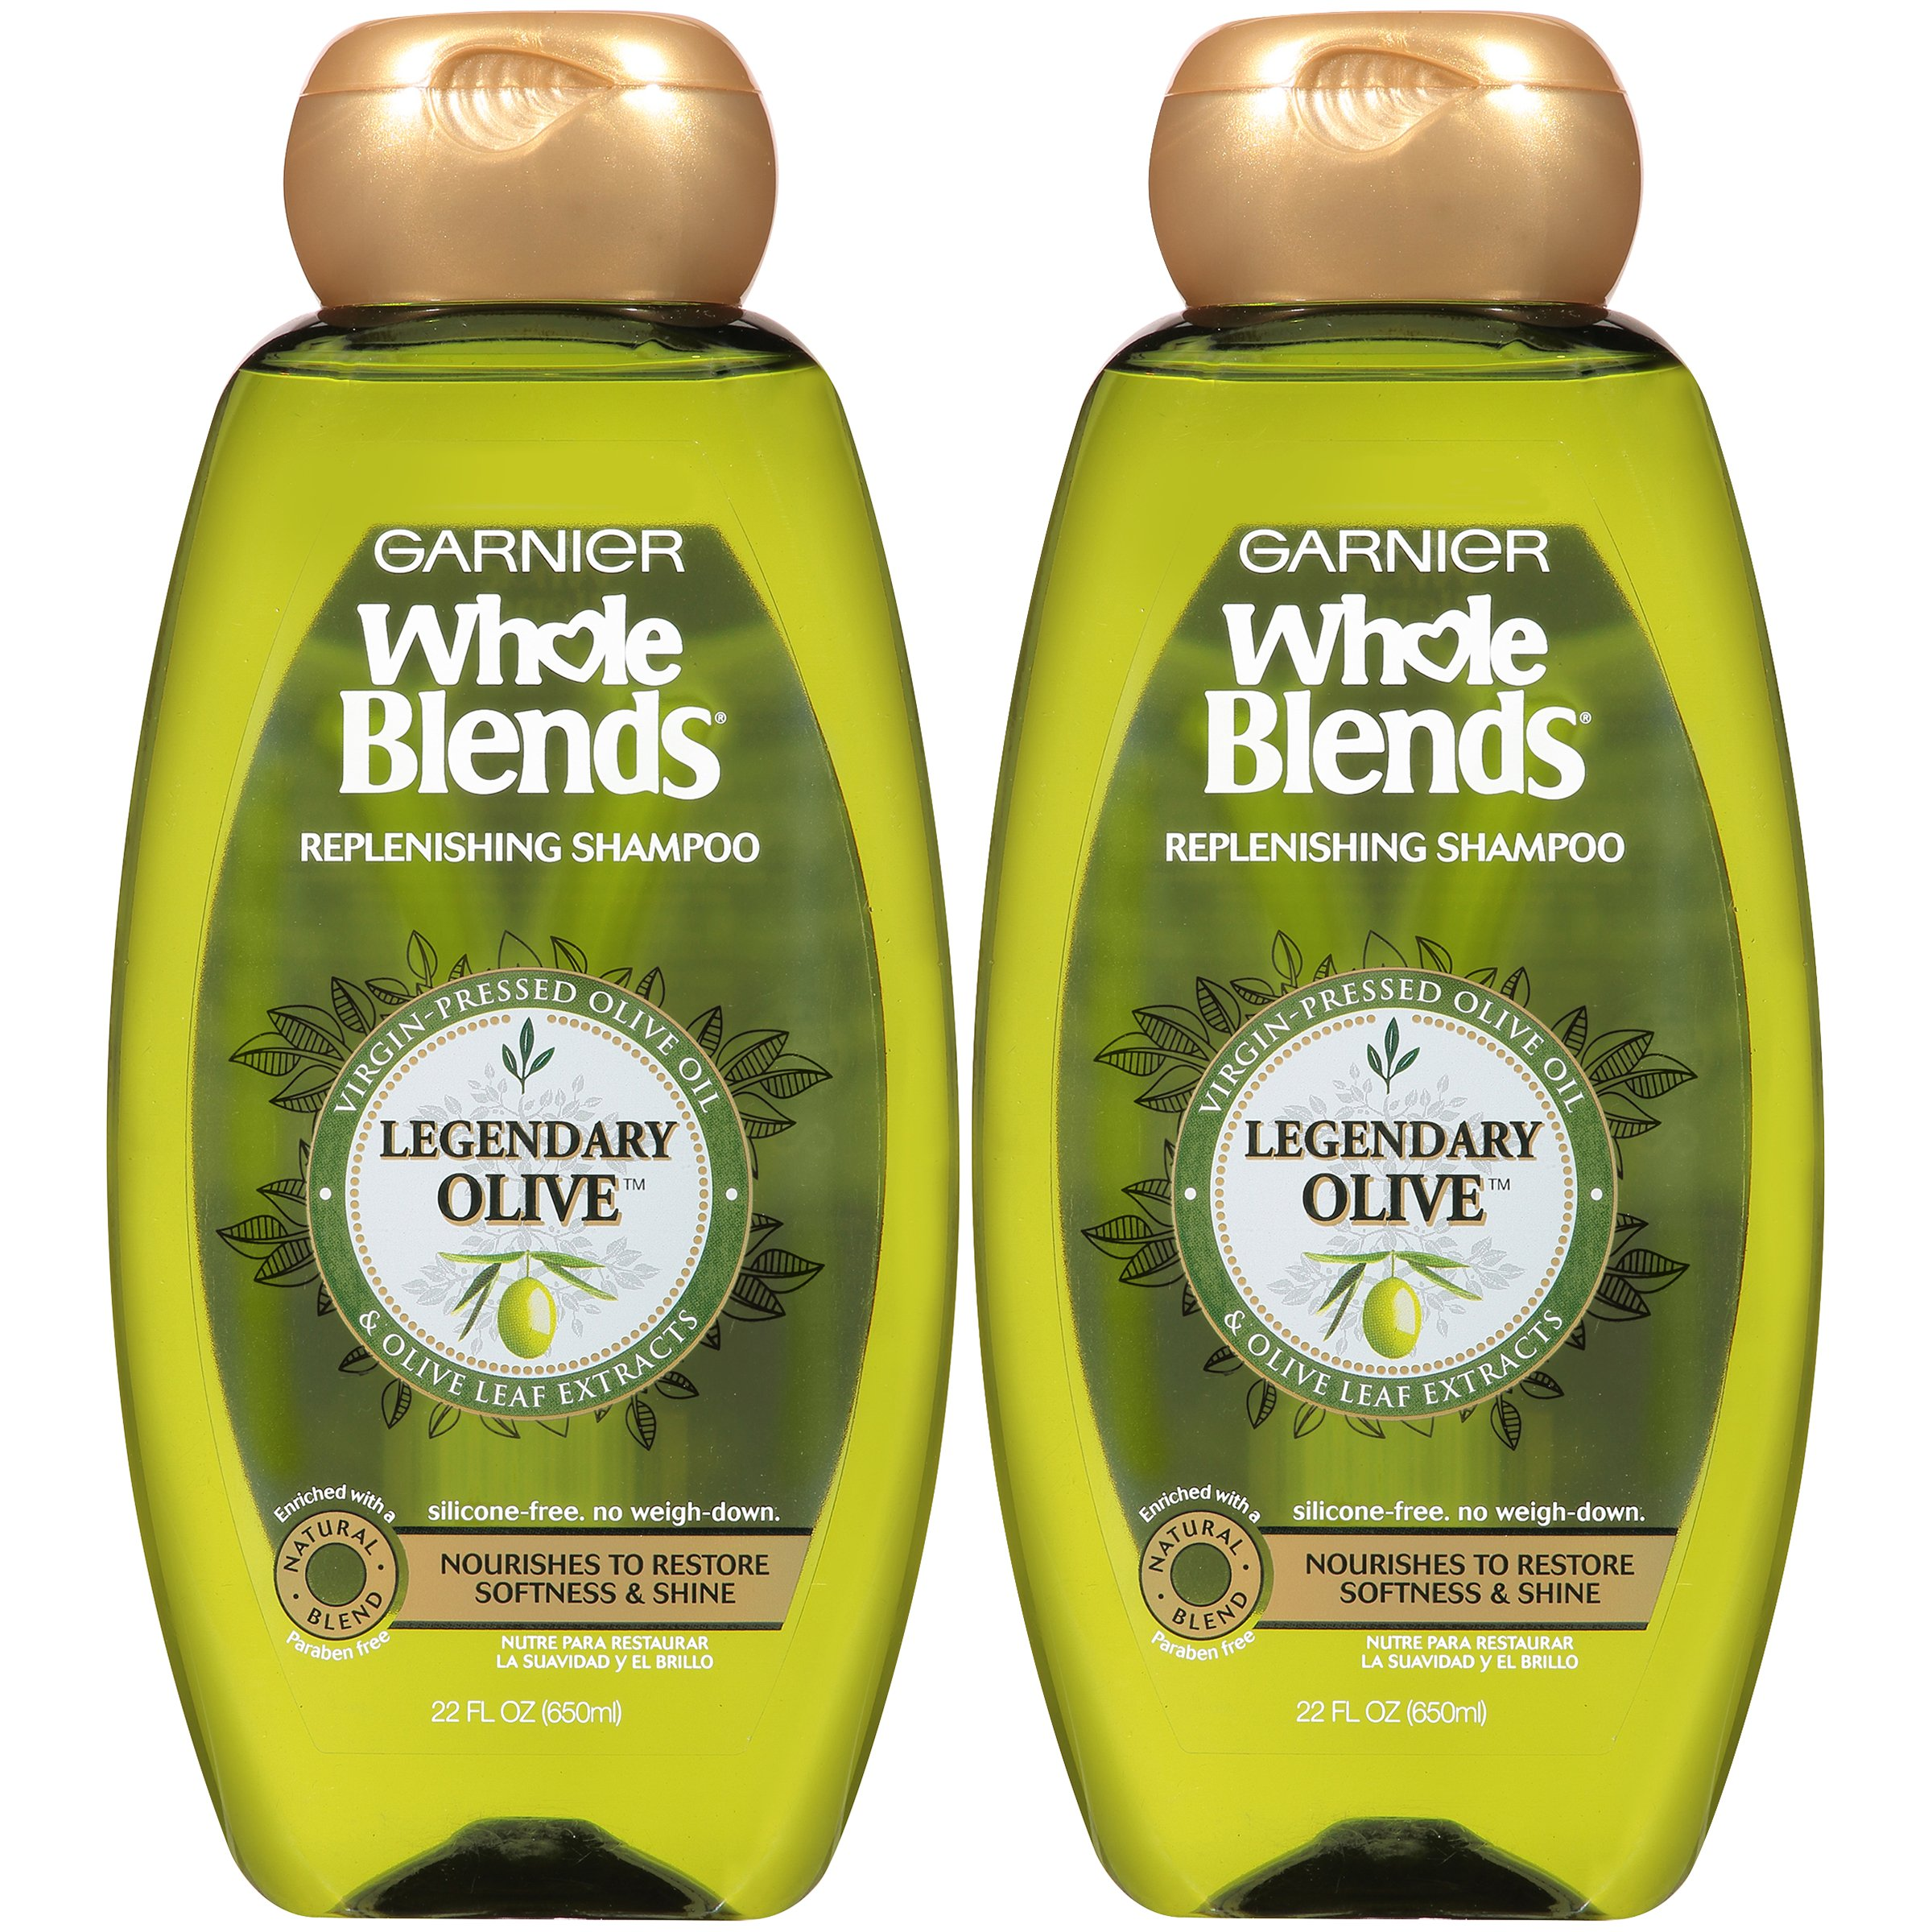 Garnier Hair Care Whole Blends Replenishing Shampoo Legendary Olive for Dry Hair, 2 Count